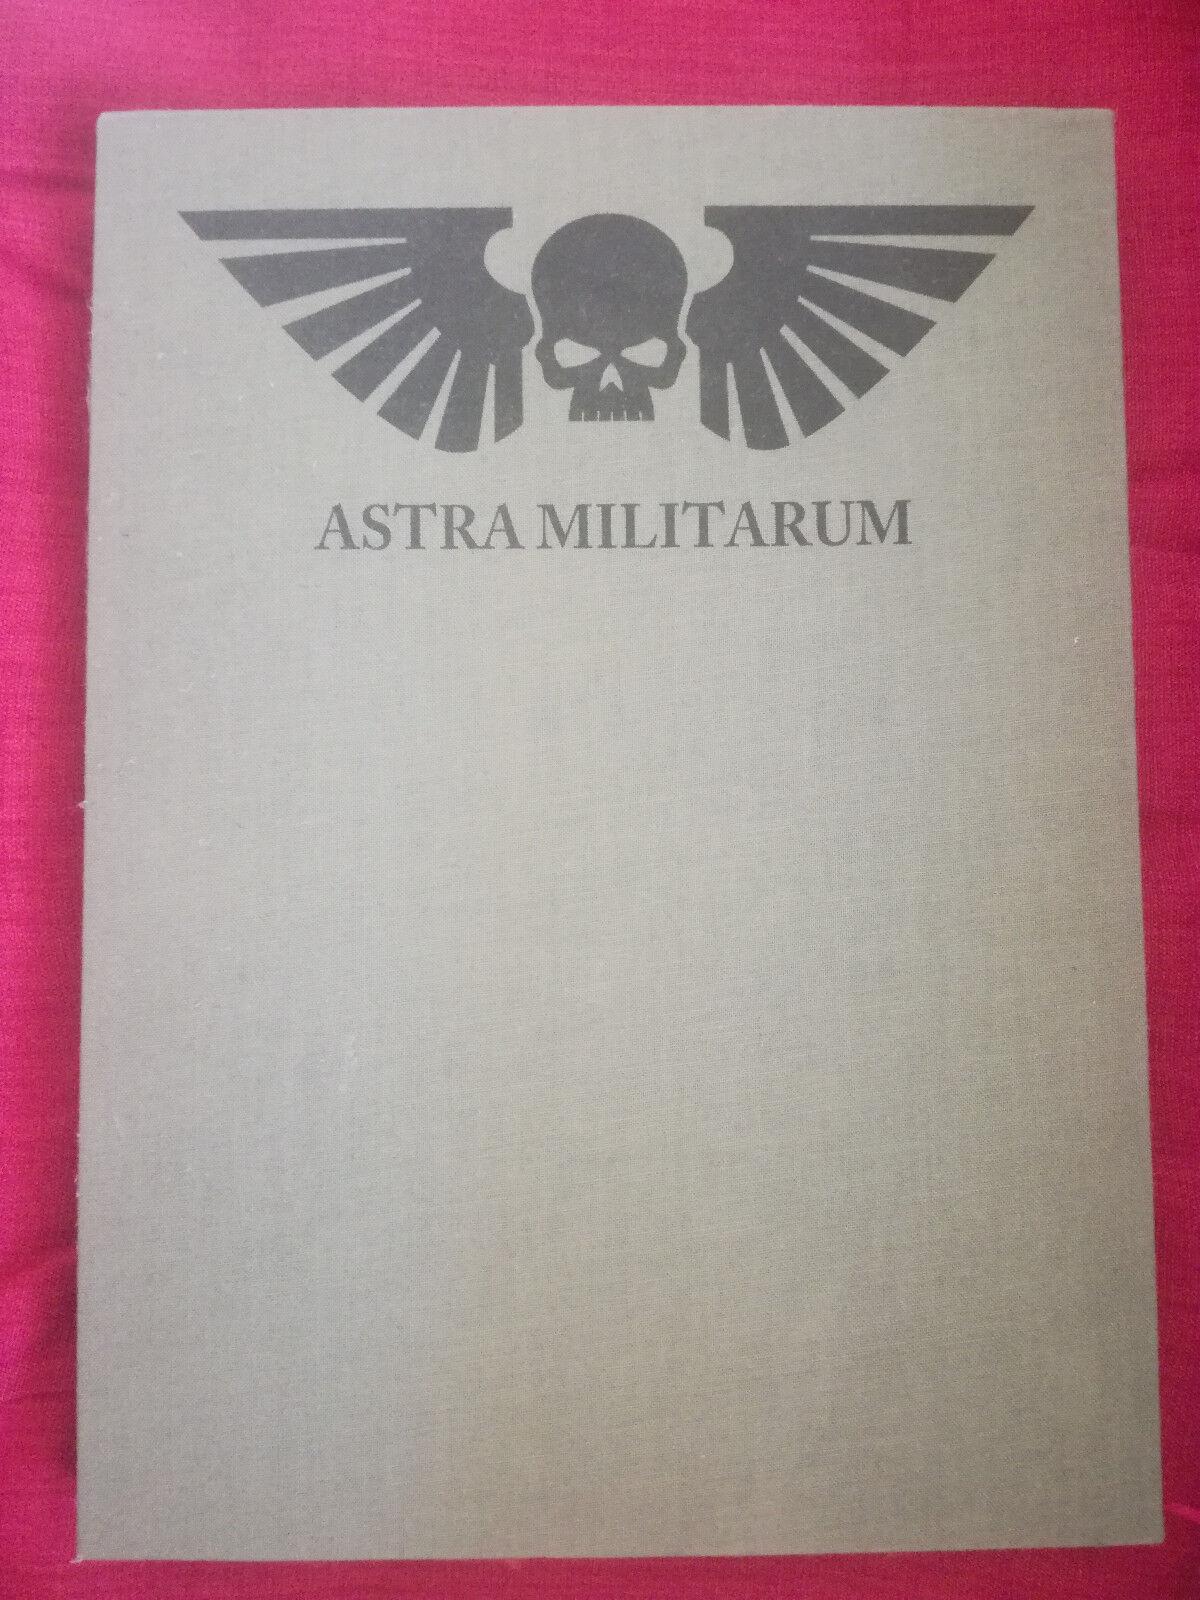 Astra militarum Imperial guard Edición Limitada Codex para Warhammer 40k 6th 7tth